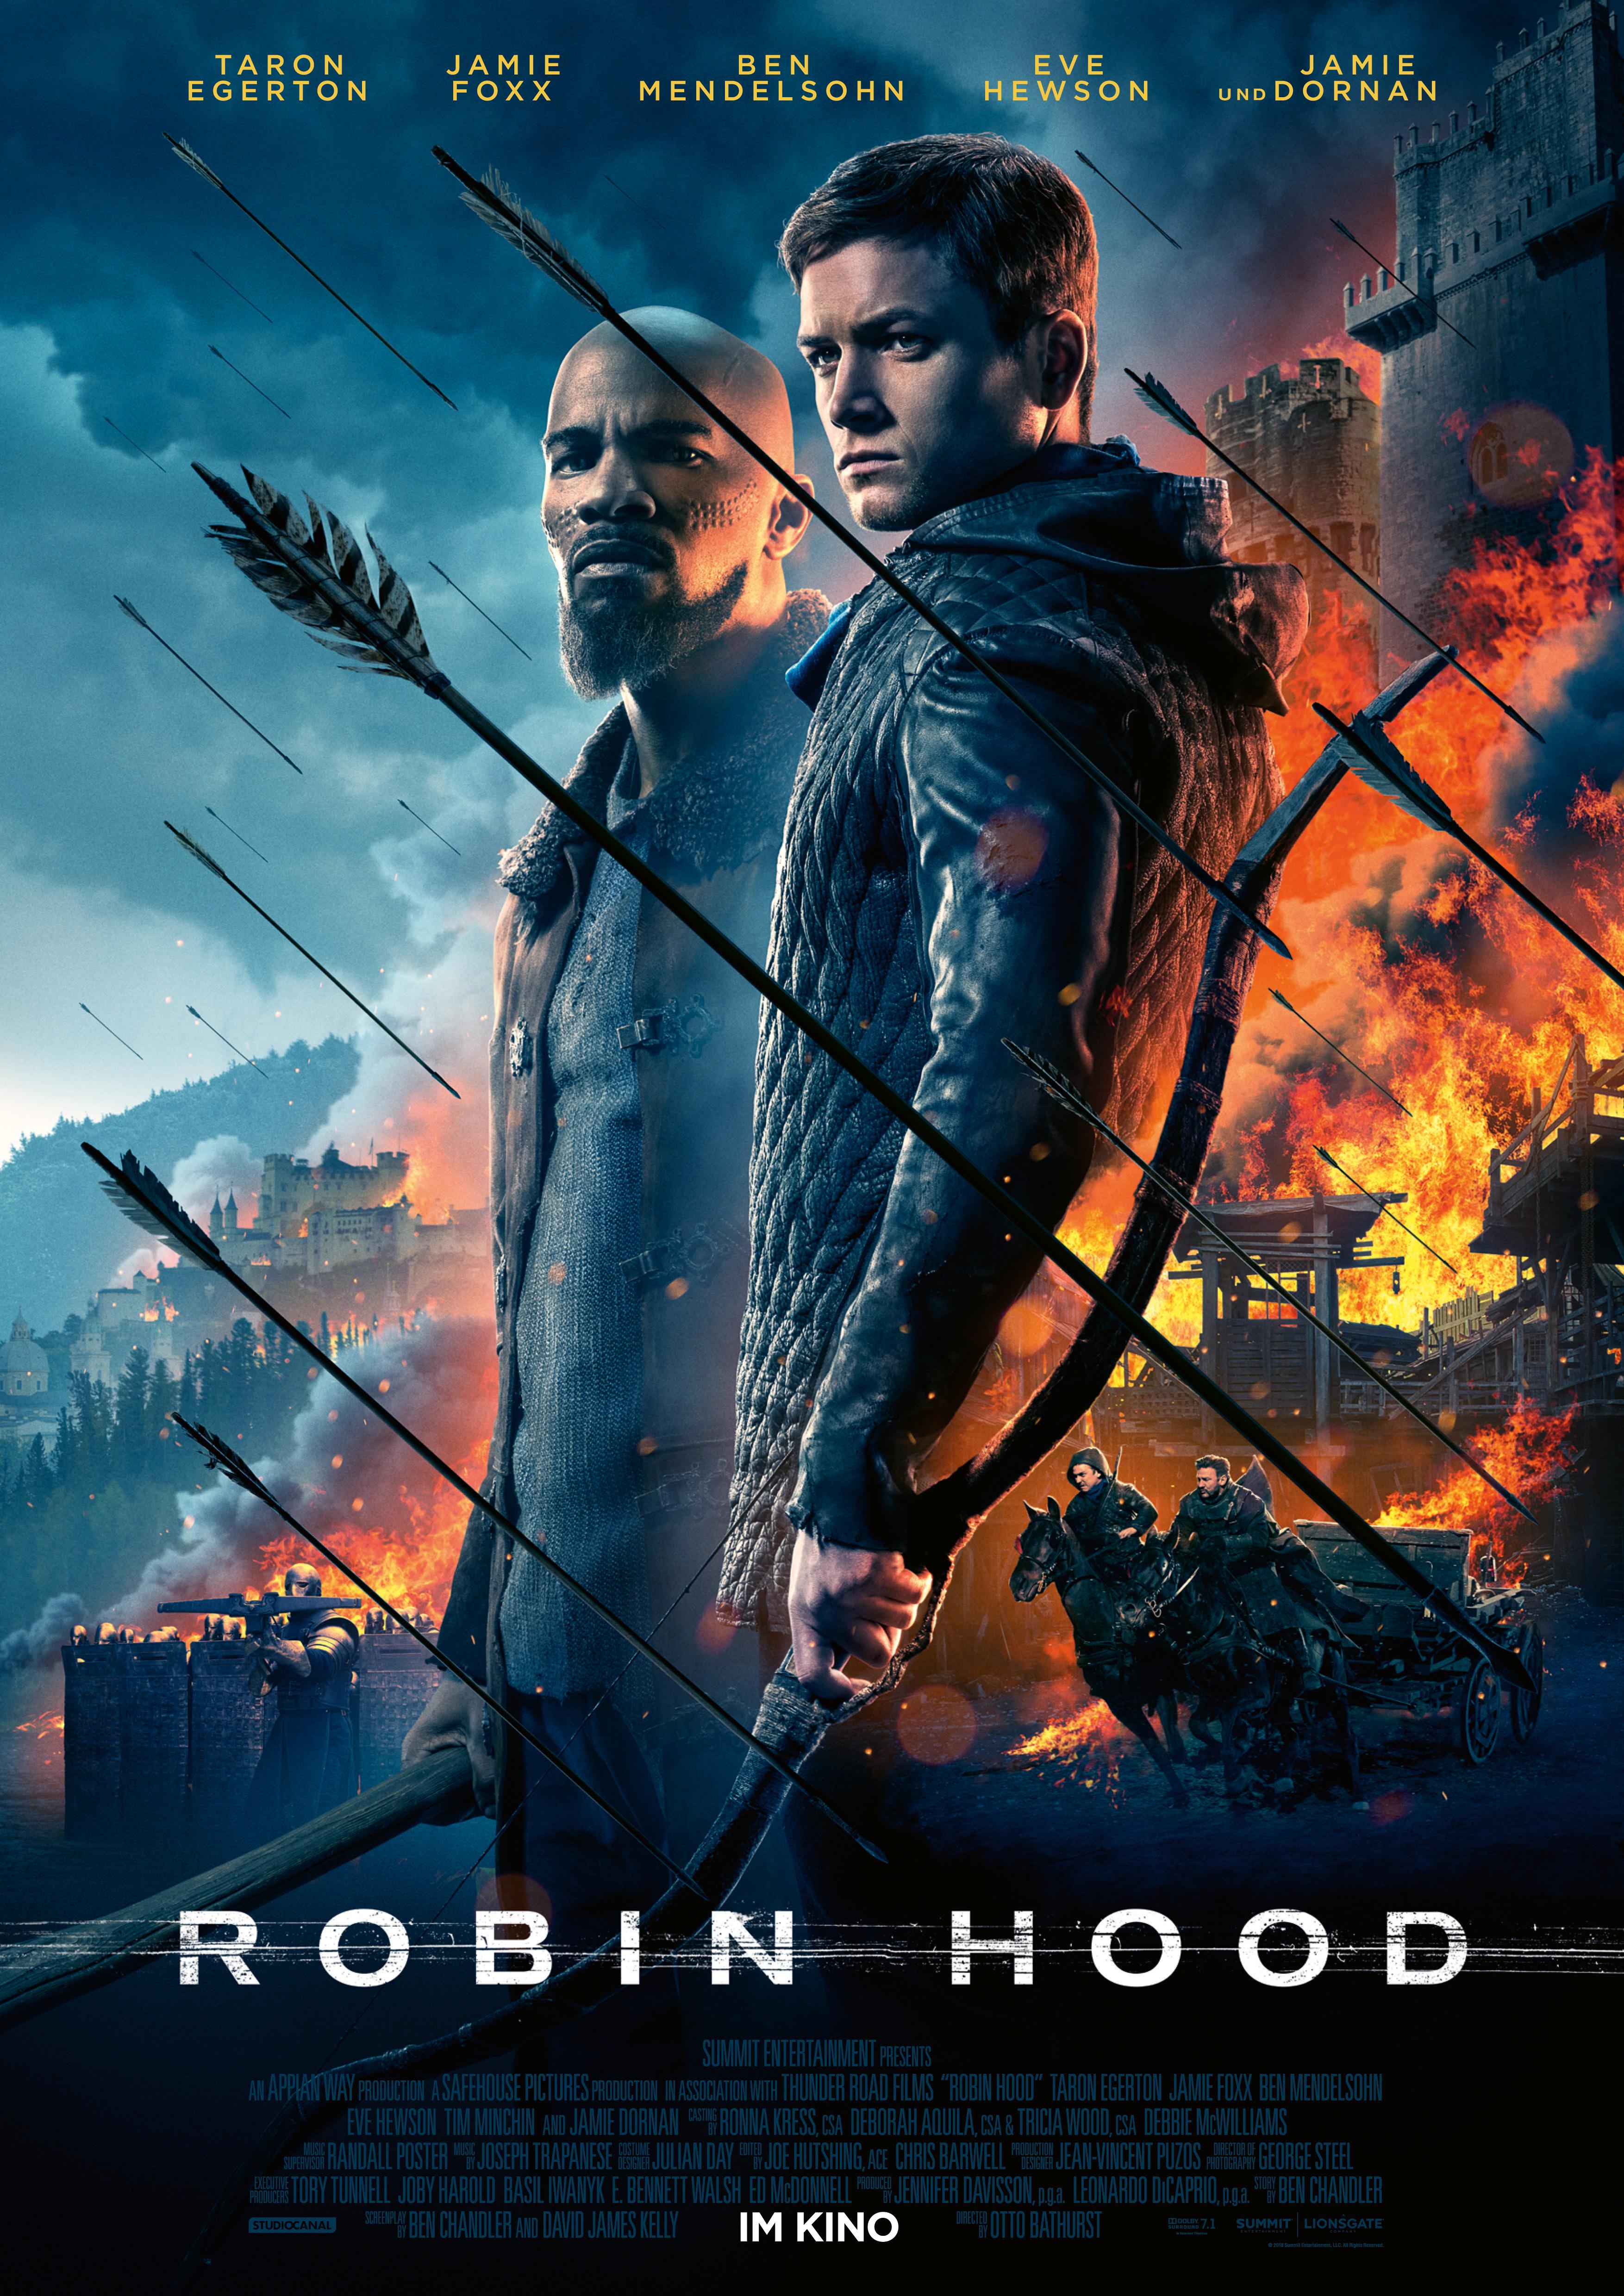 Filme Weihnachten 2019.Robin Hood 2019 Film 2018 Trailer Kritik Kino De